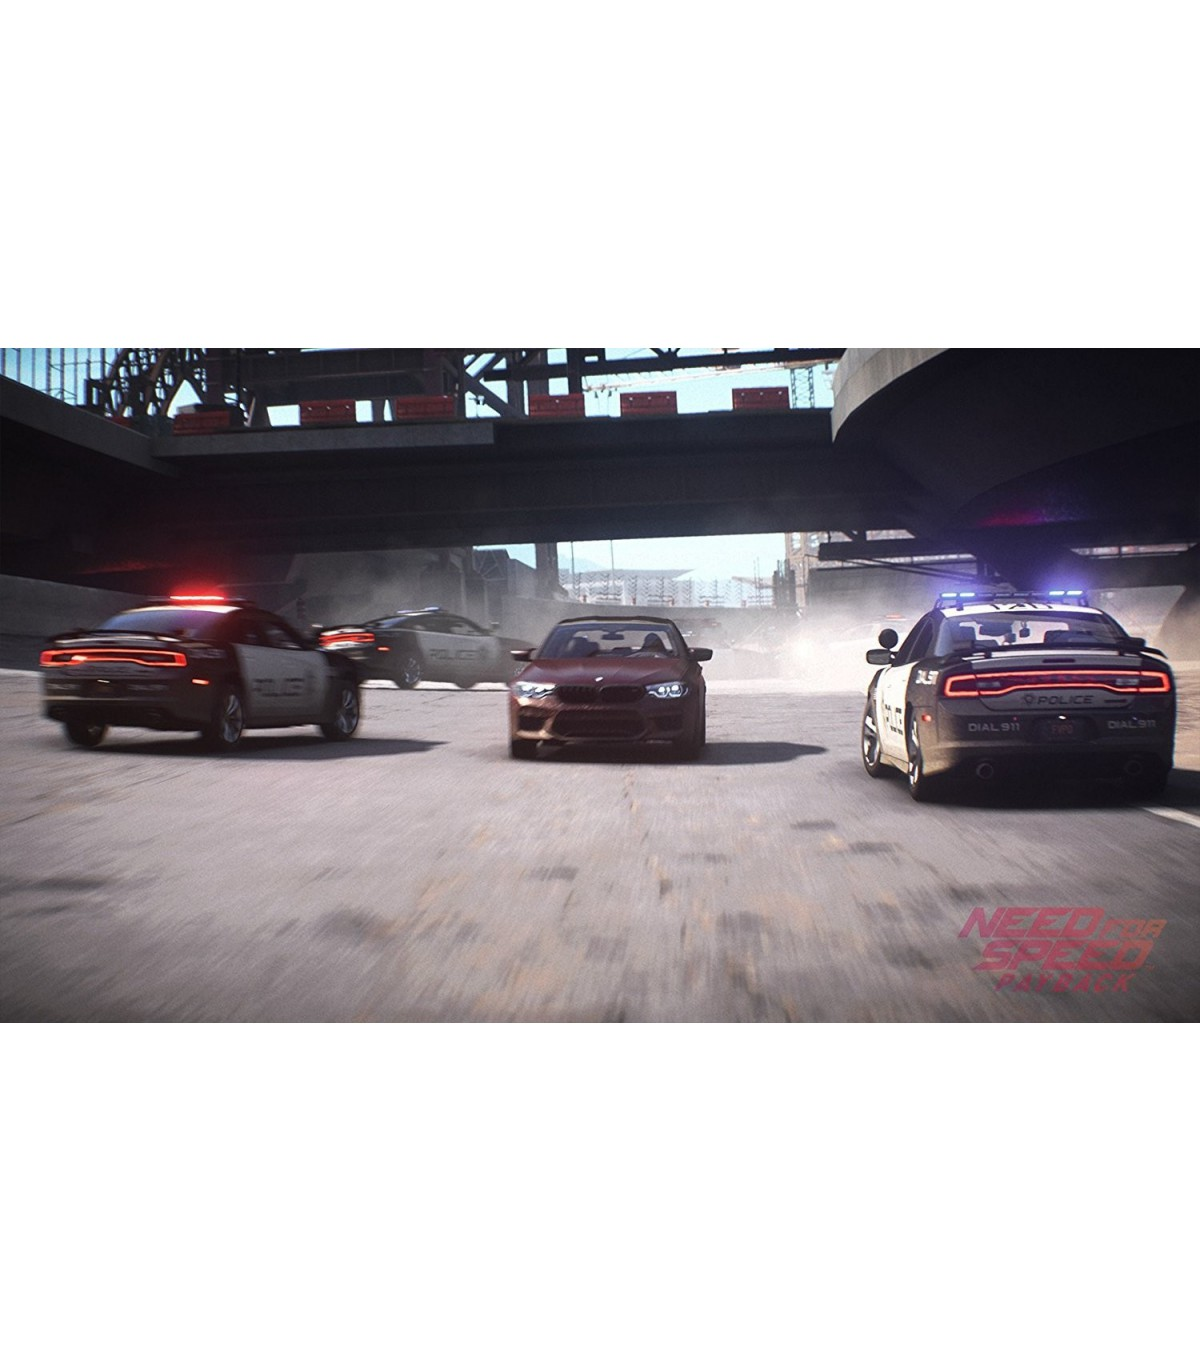 بازی Need for Speed Payback - پلی استیشن 4